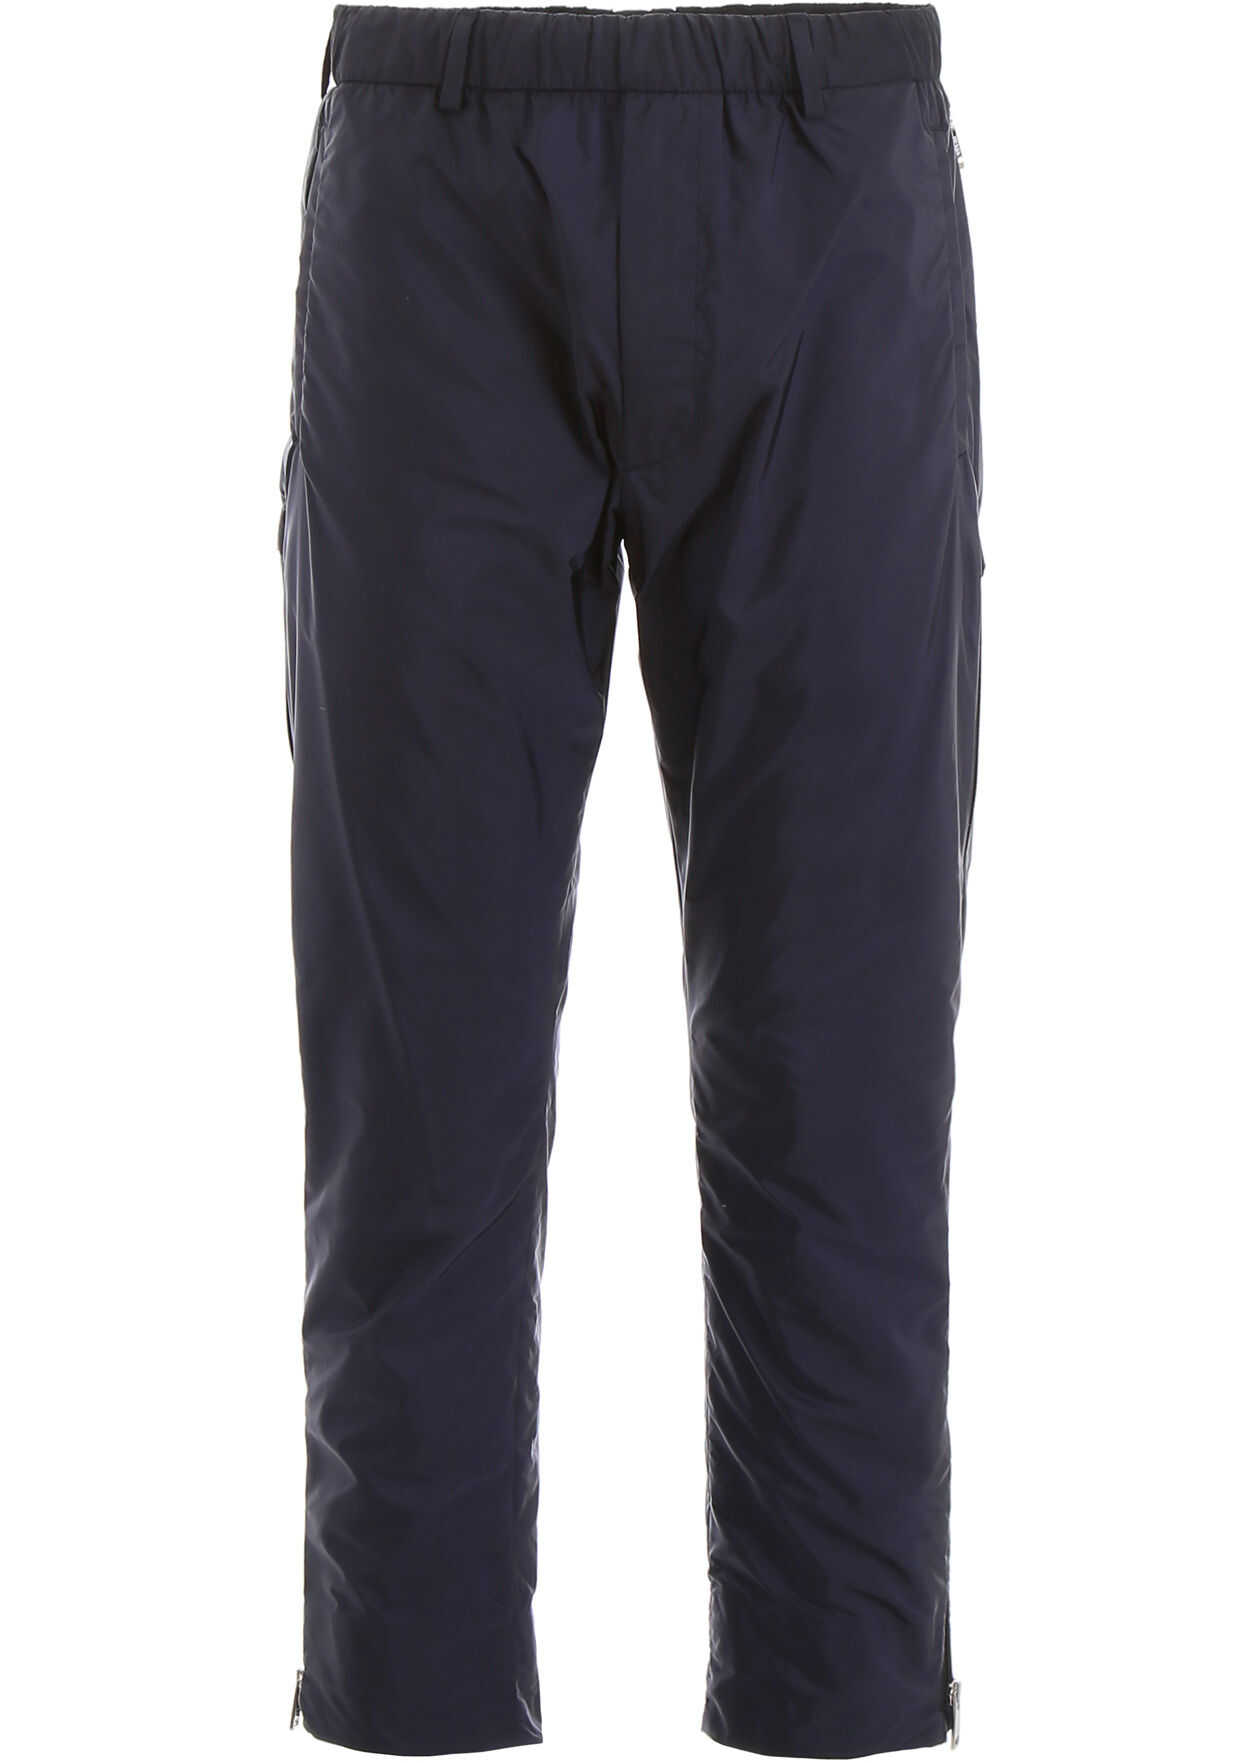 Prada Nylon Trousers NAVY